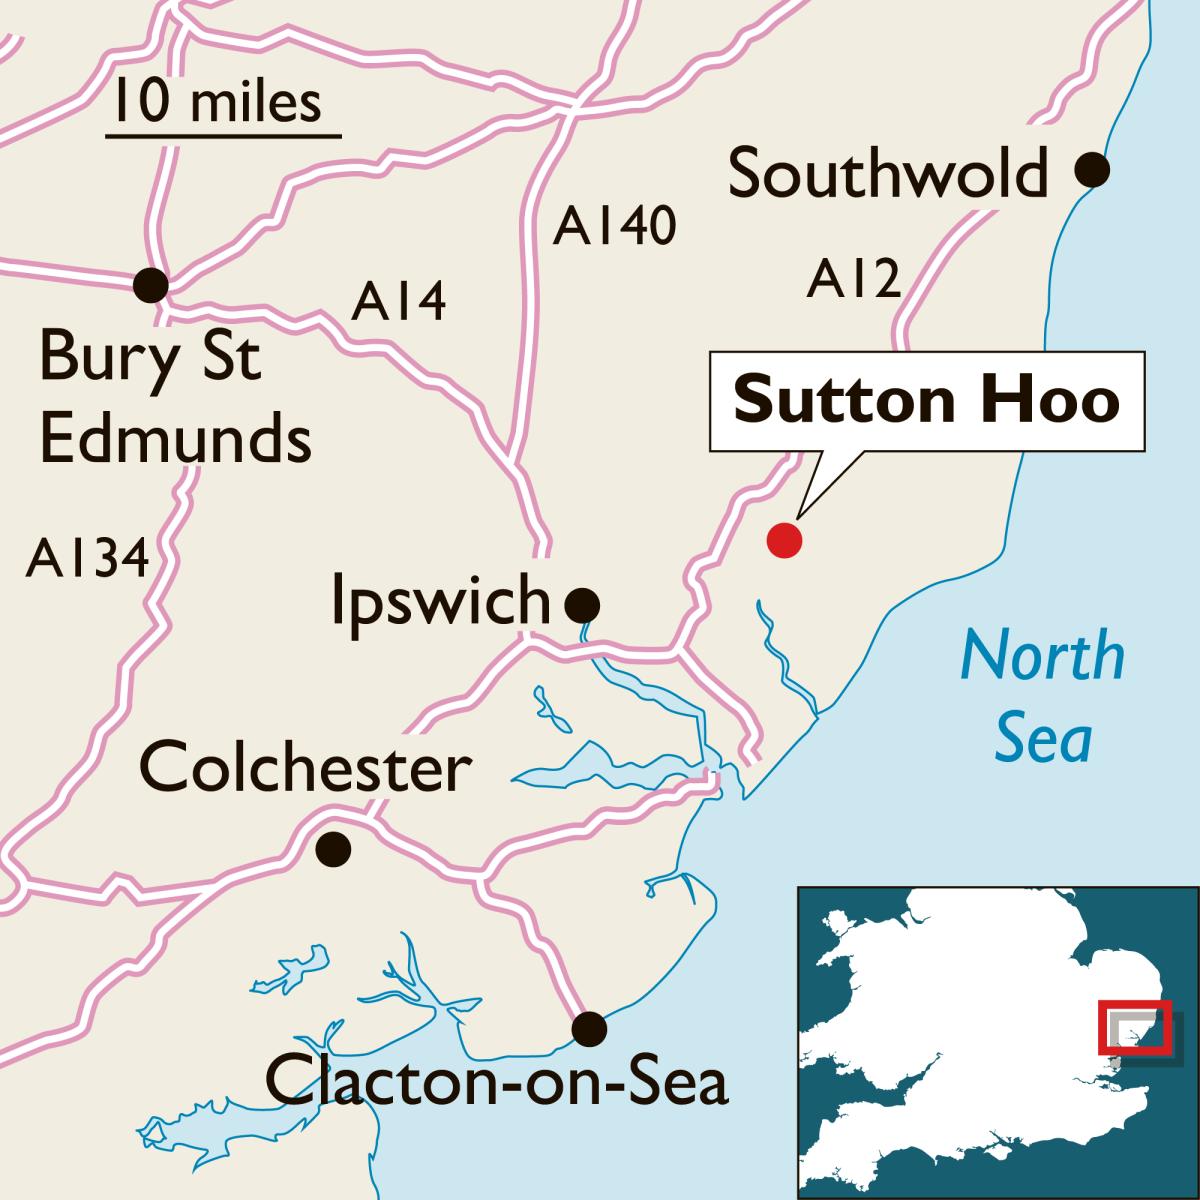 Sutton Hoo, England